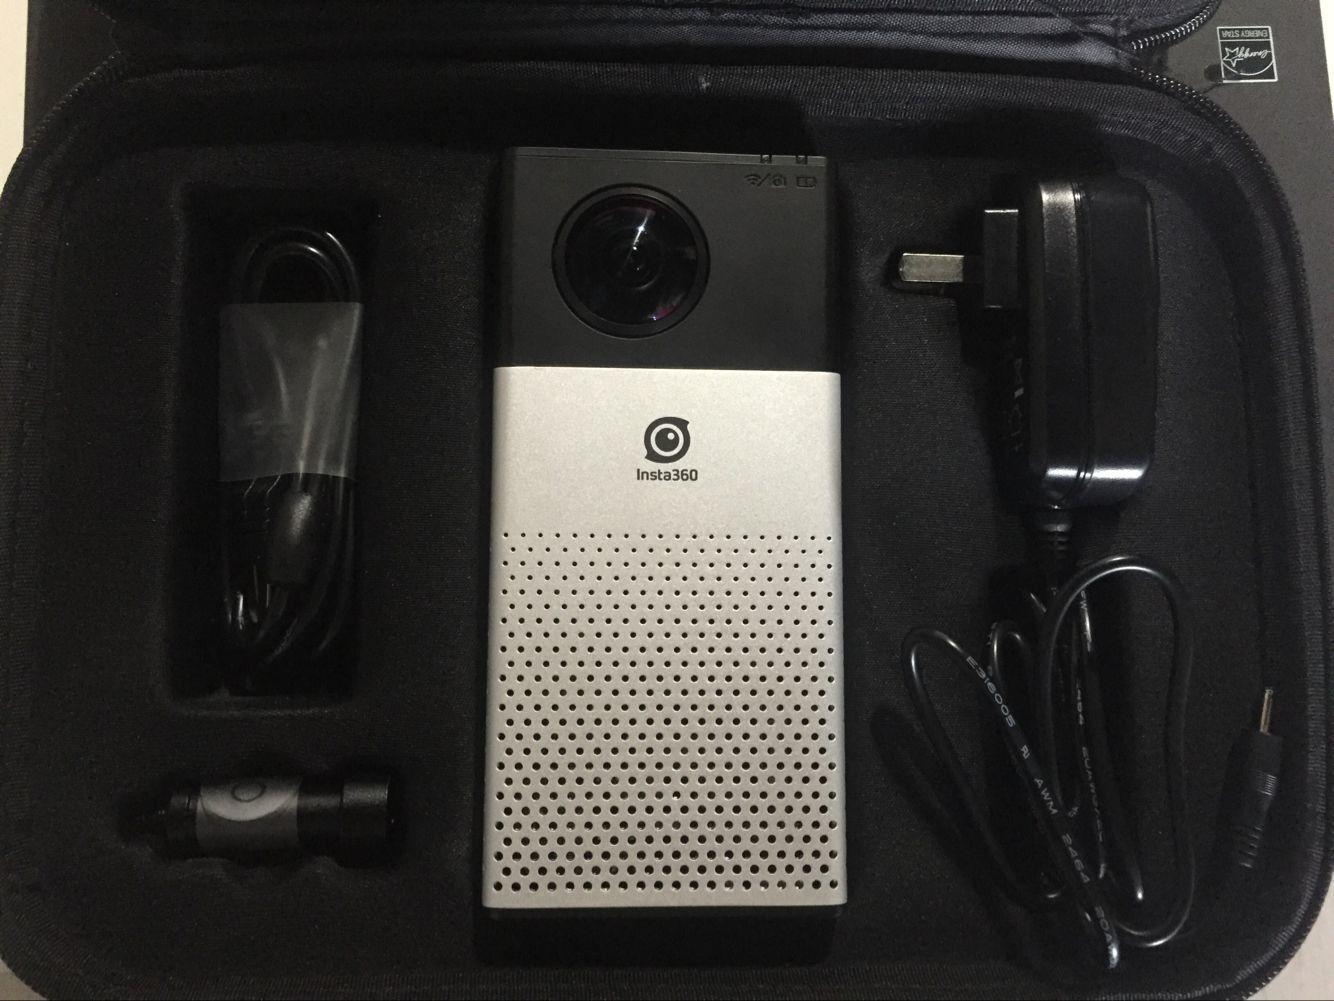 Professional Insta360 Lightweight Compact Mini Panoramic Panorama Camera 4K HD Dual-len Panorama CD50